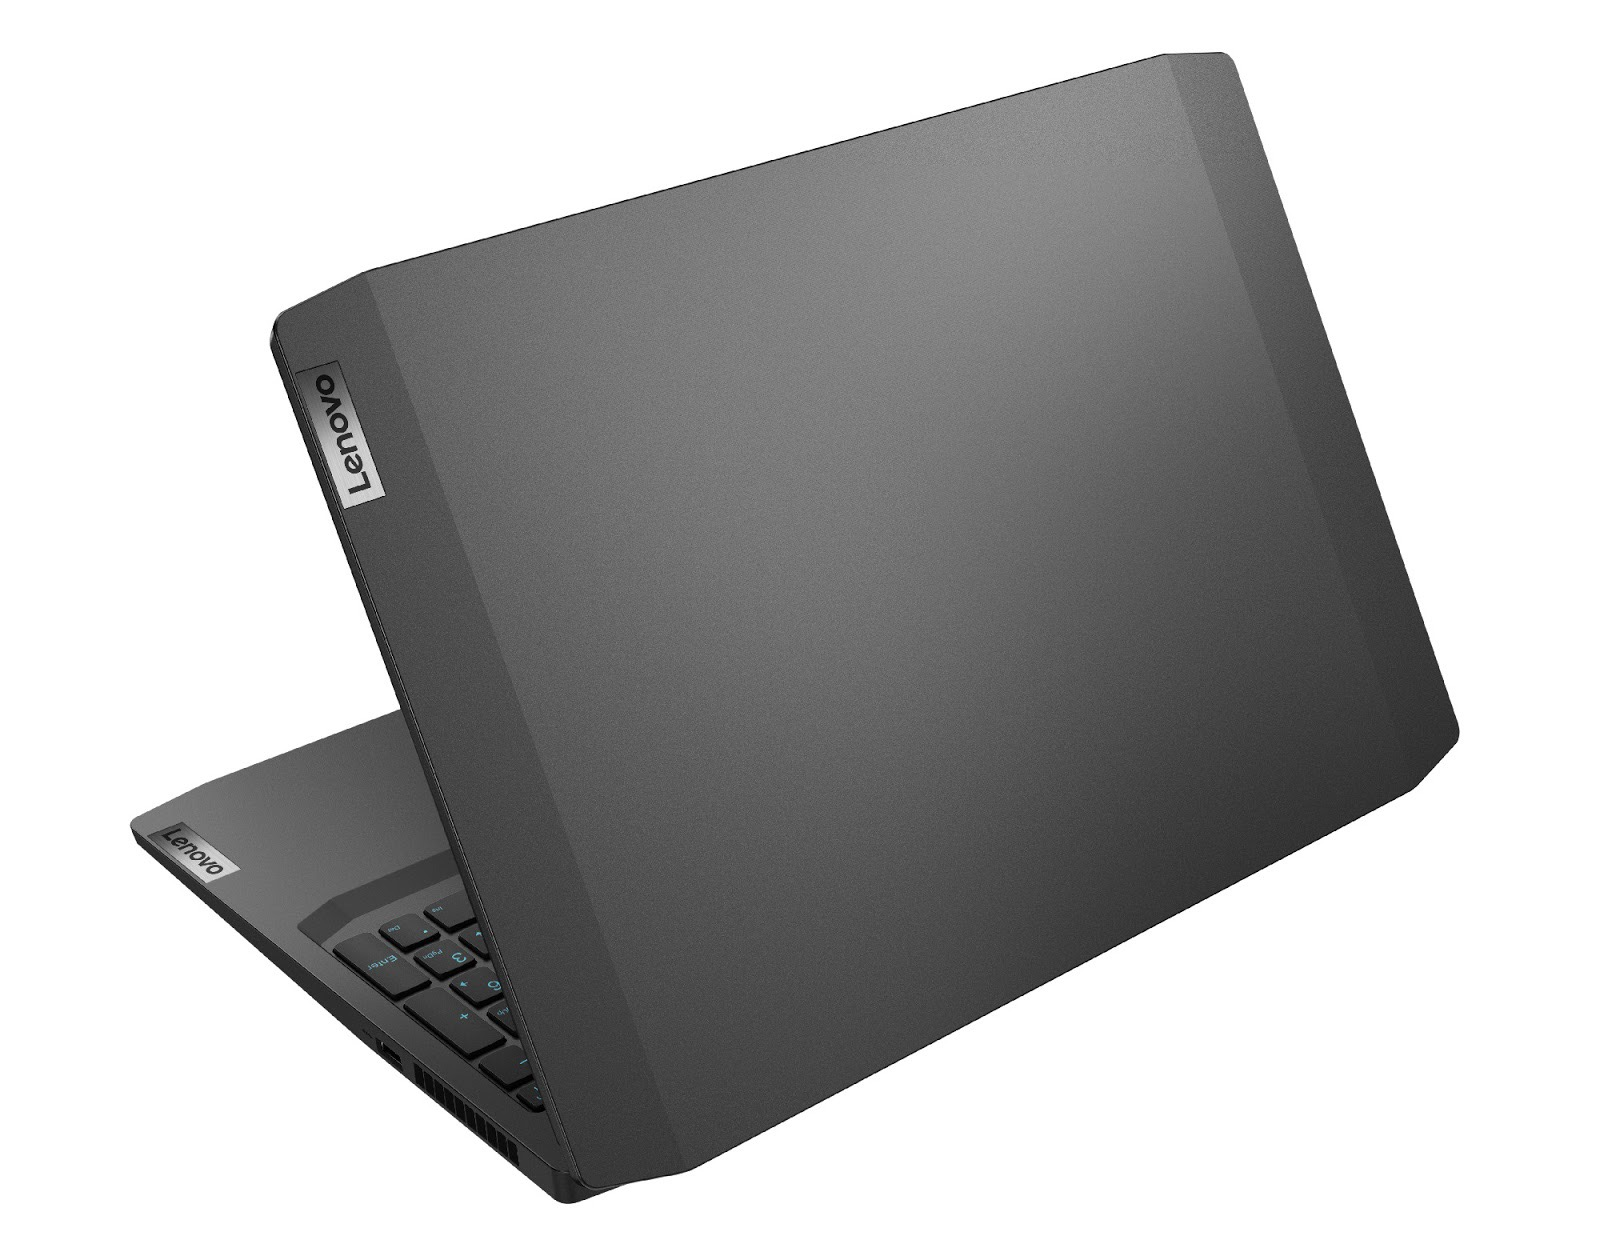 Фото 2. Ноутбук Lenovo ideapad Gaming 3 15IMH05 Onyx Black (81Y400CJRE)